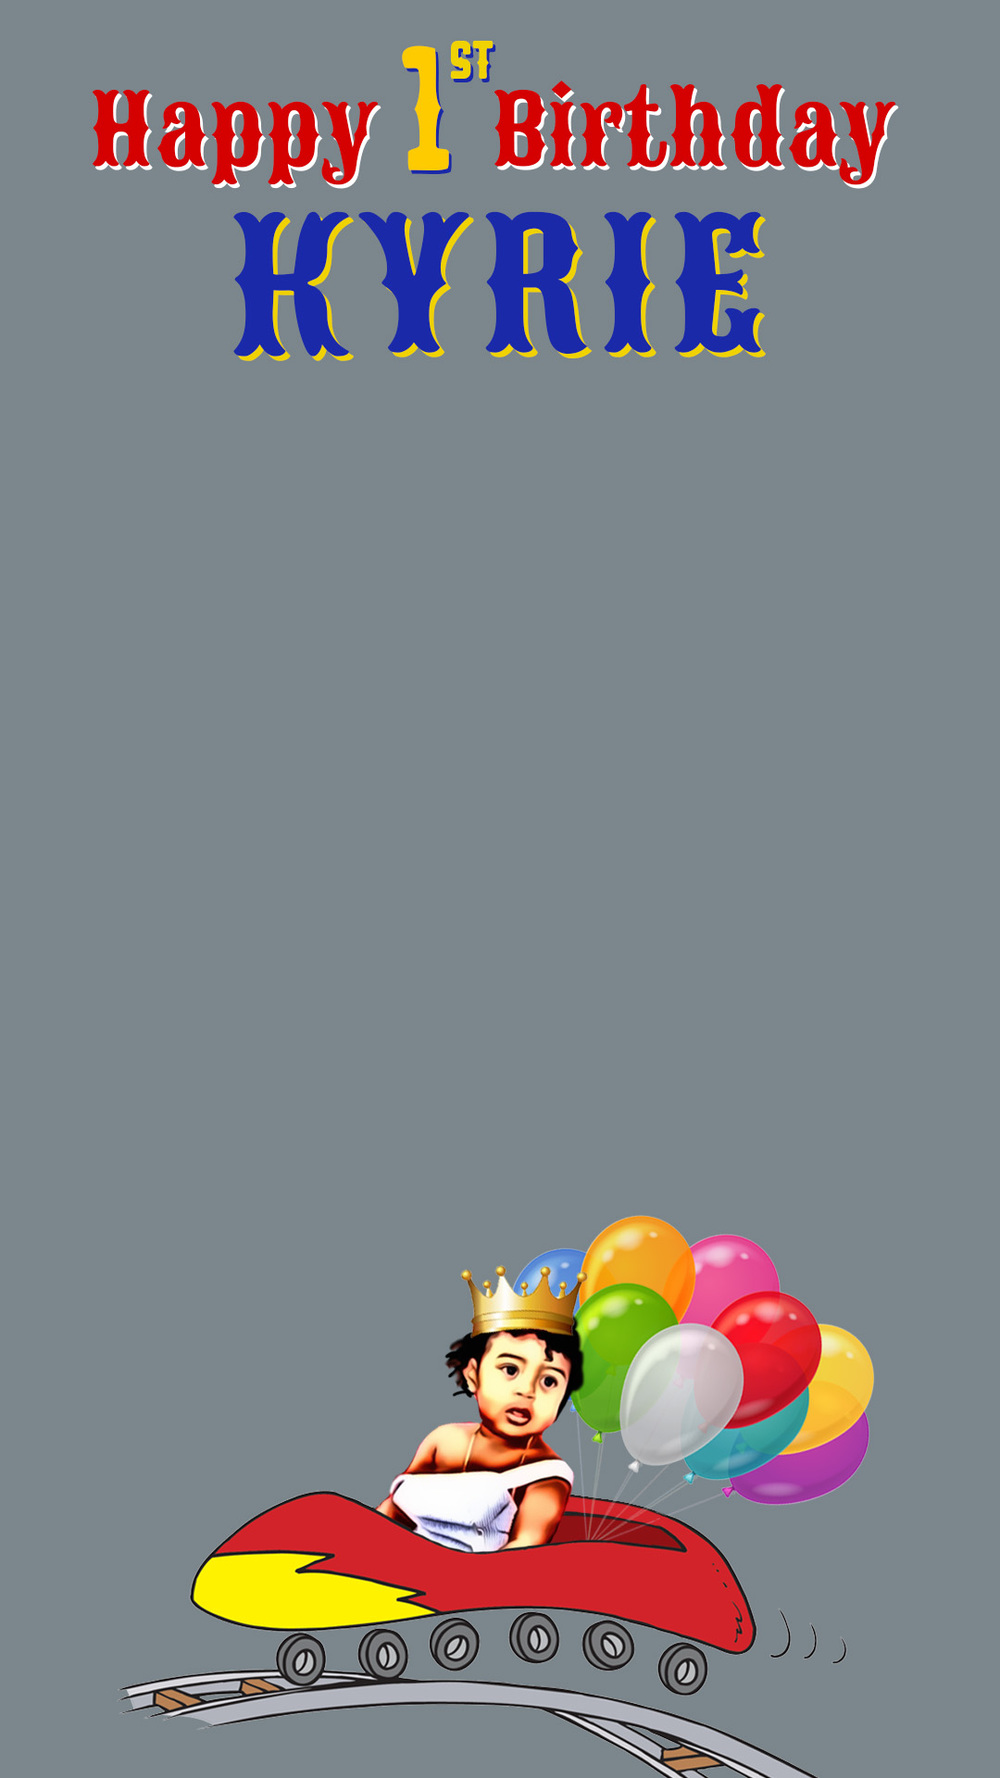 King kyrie birthday.jpg